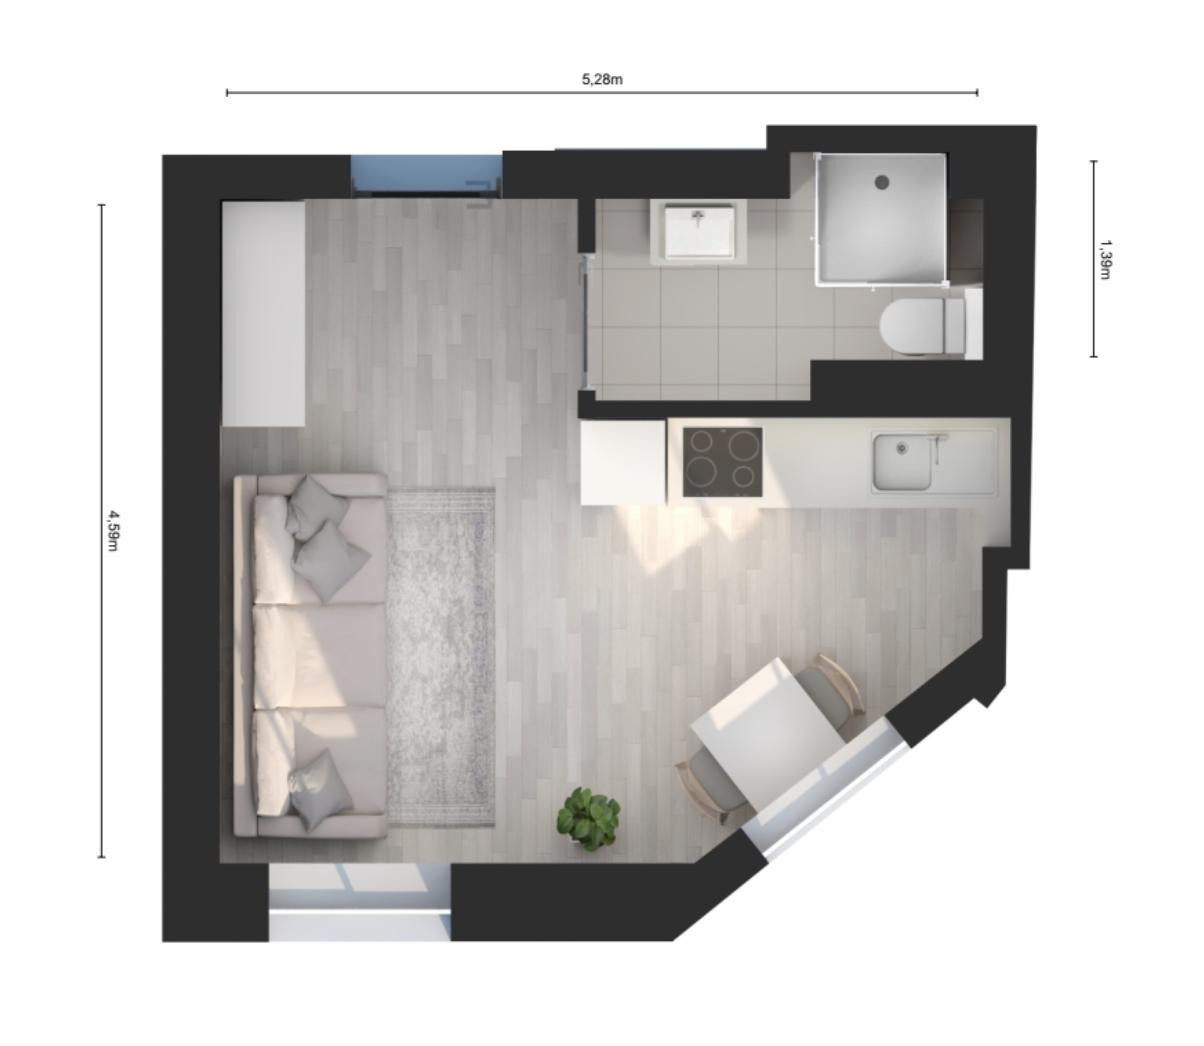 Lodz Studio flat